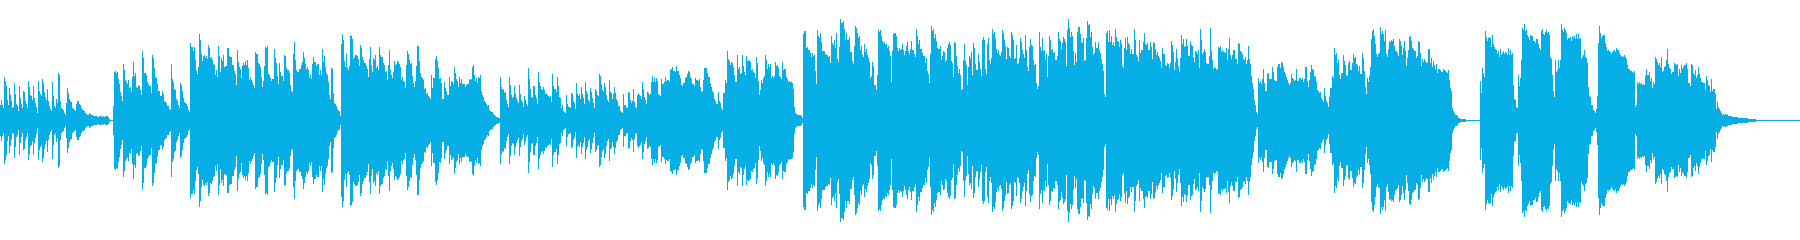 J-POP風のメロディ、インストバラードの再生済みの波形